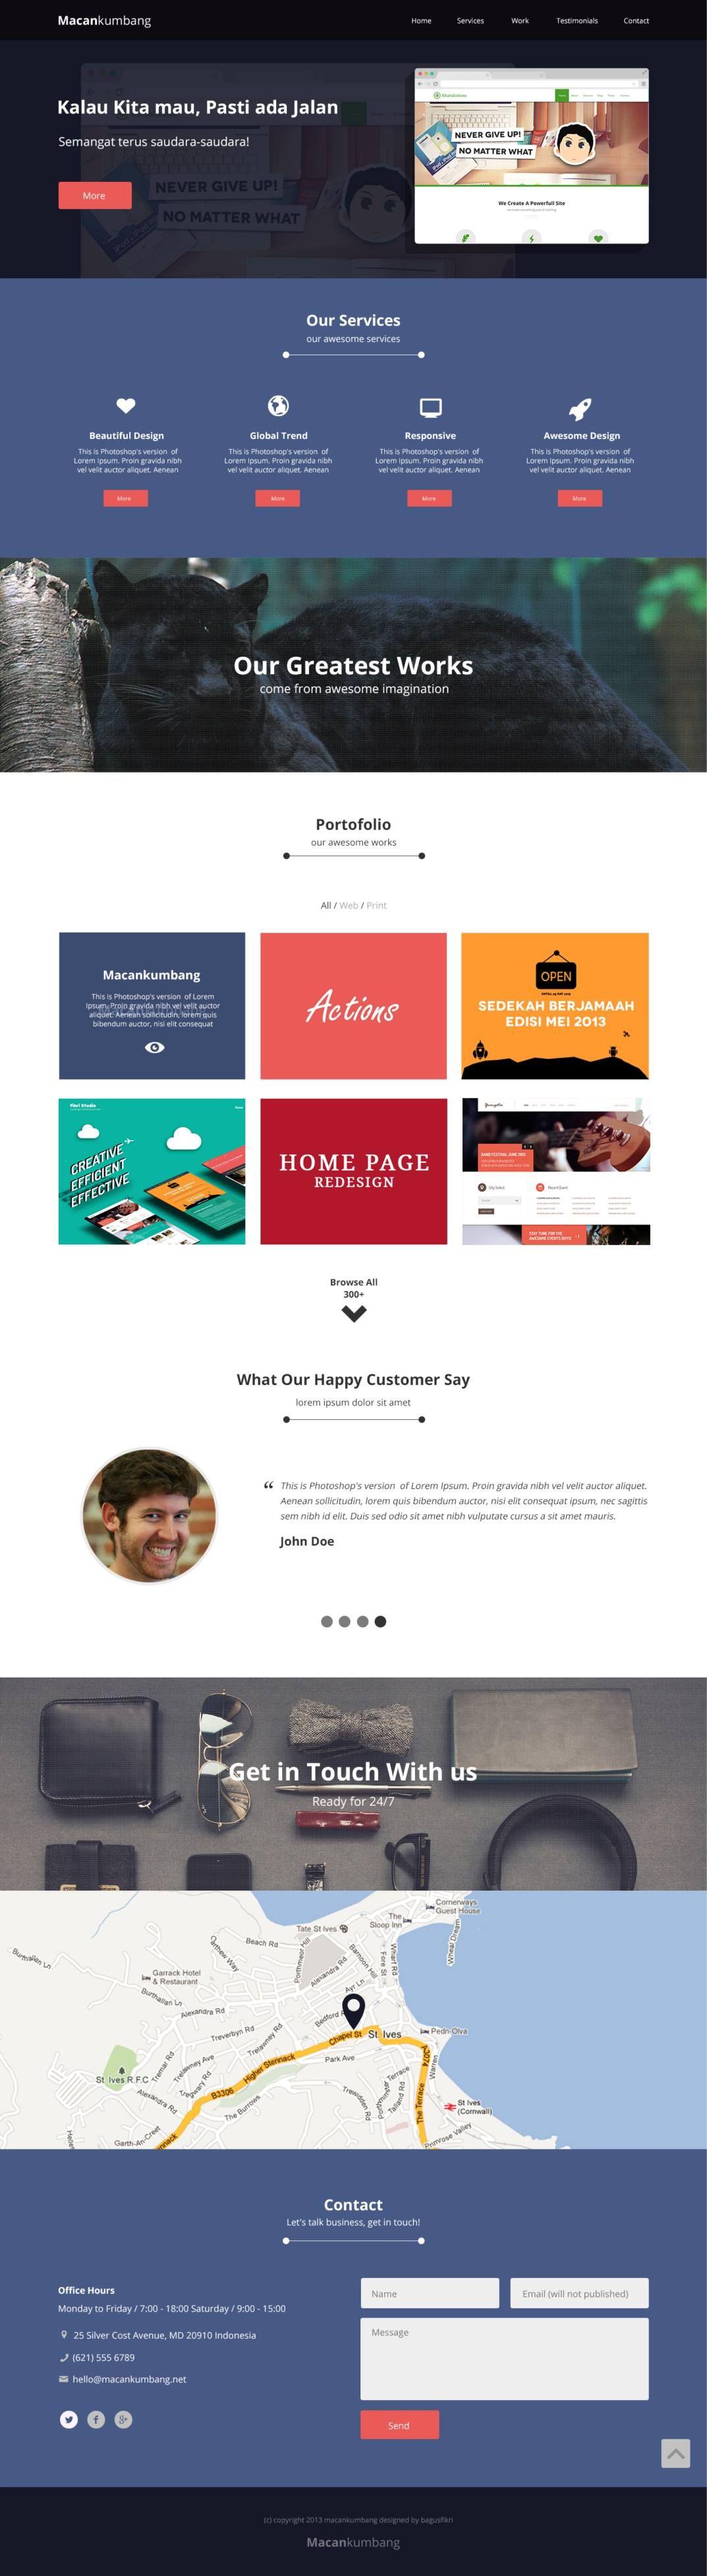 One Page Website Design Macan Kumbang Fribly Web Design Resources Website Design Web Development Design